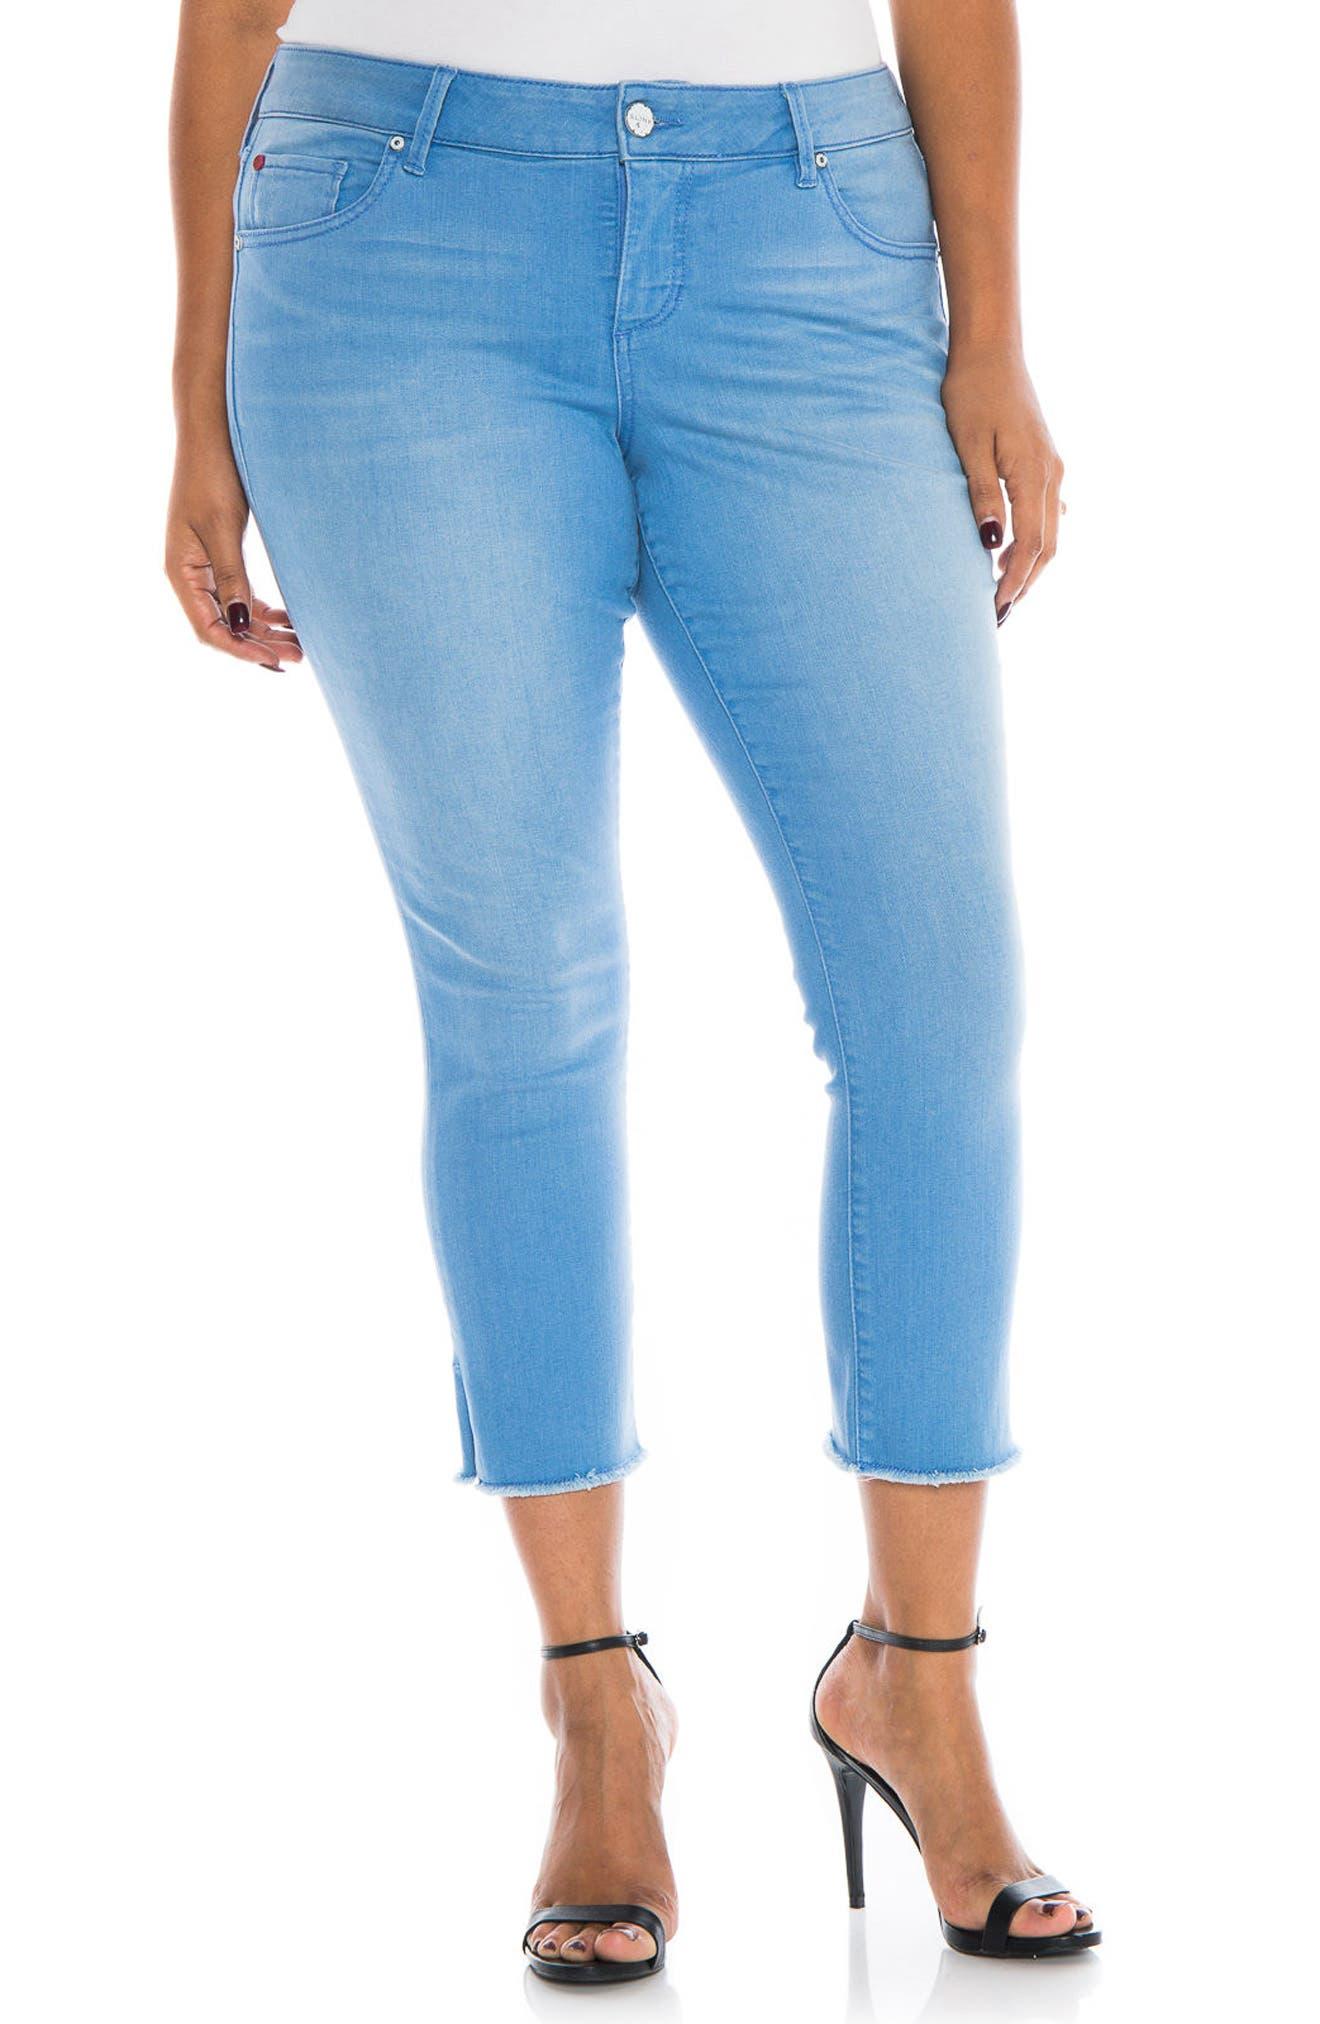 Alternate Image 1 Selected - SLINK Jeans Fray Hem Crop Skinny Jeans (Cloe) (Plus Size)